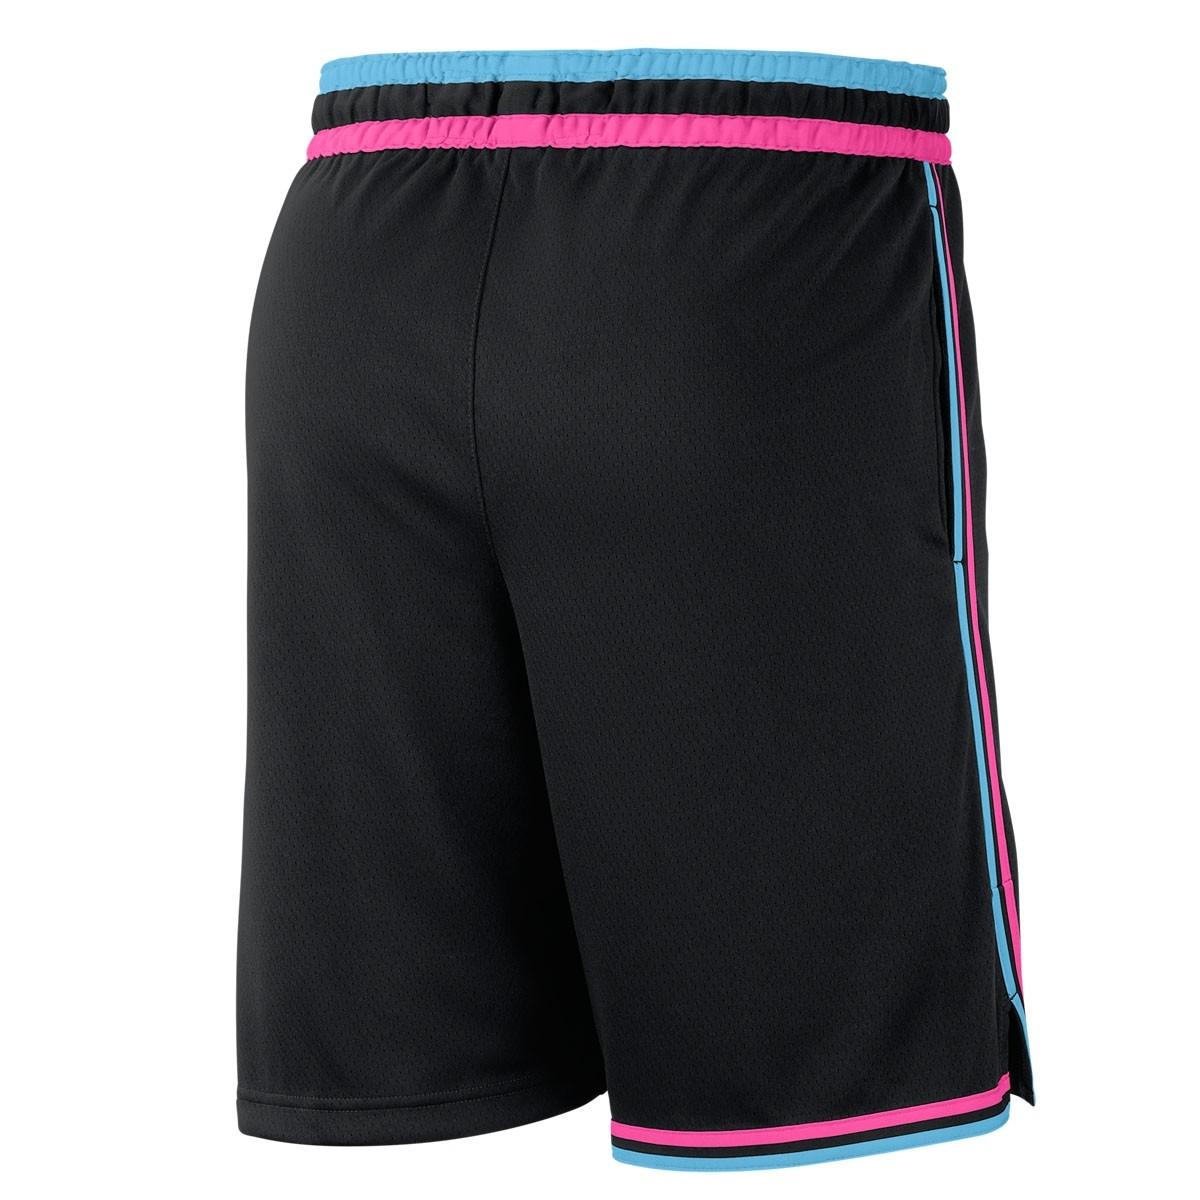 Nike NBA Miami Heat Swingman Short 'City Edition' 912120-010